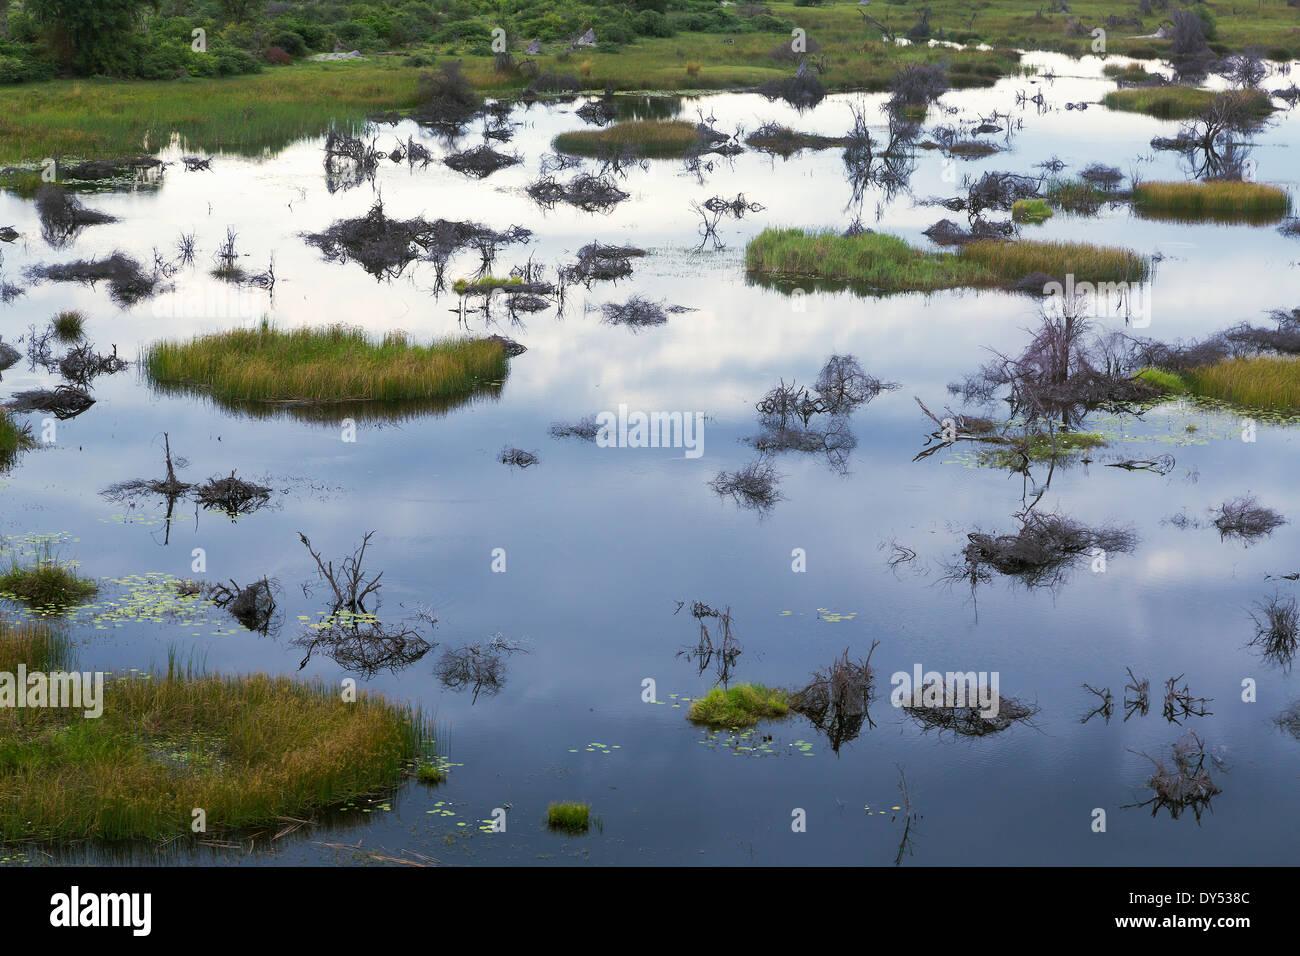 Okavango Delta, Chobe National Park, Botswana, Africa - Stock Image